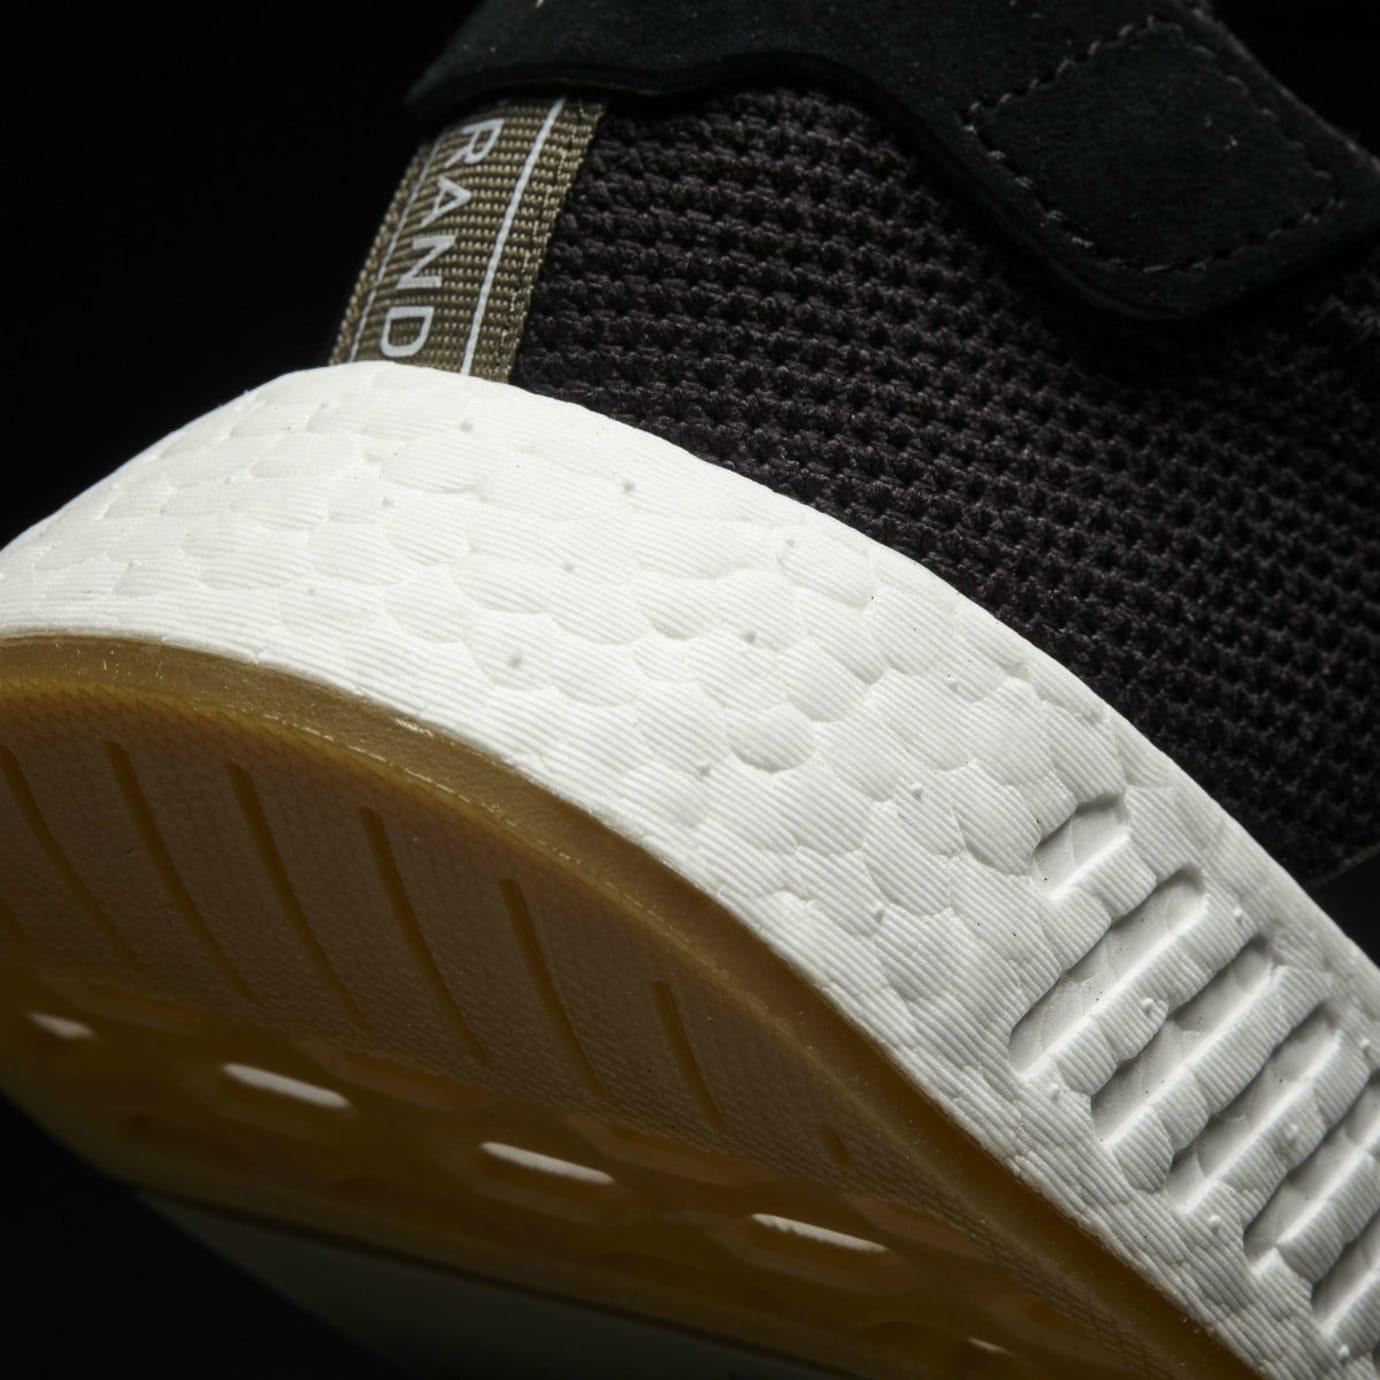 d0f76e2400ec2 Adidas NMD R2 Black Gum Release Date Heel BY9917